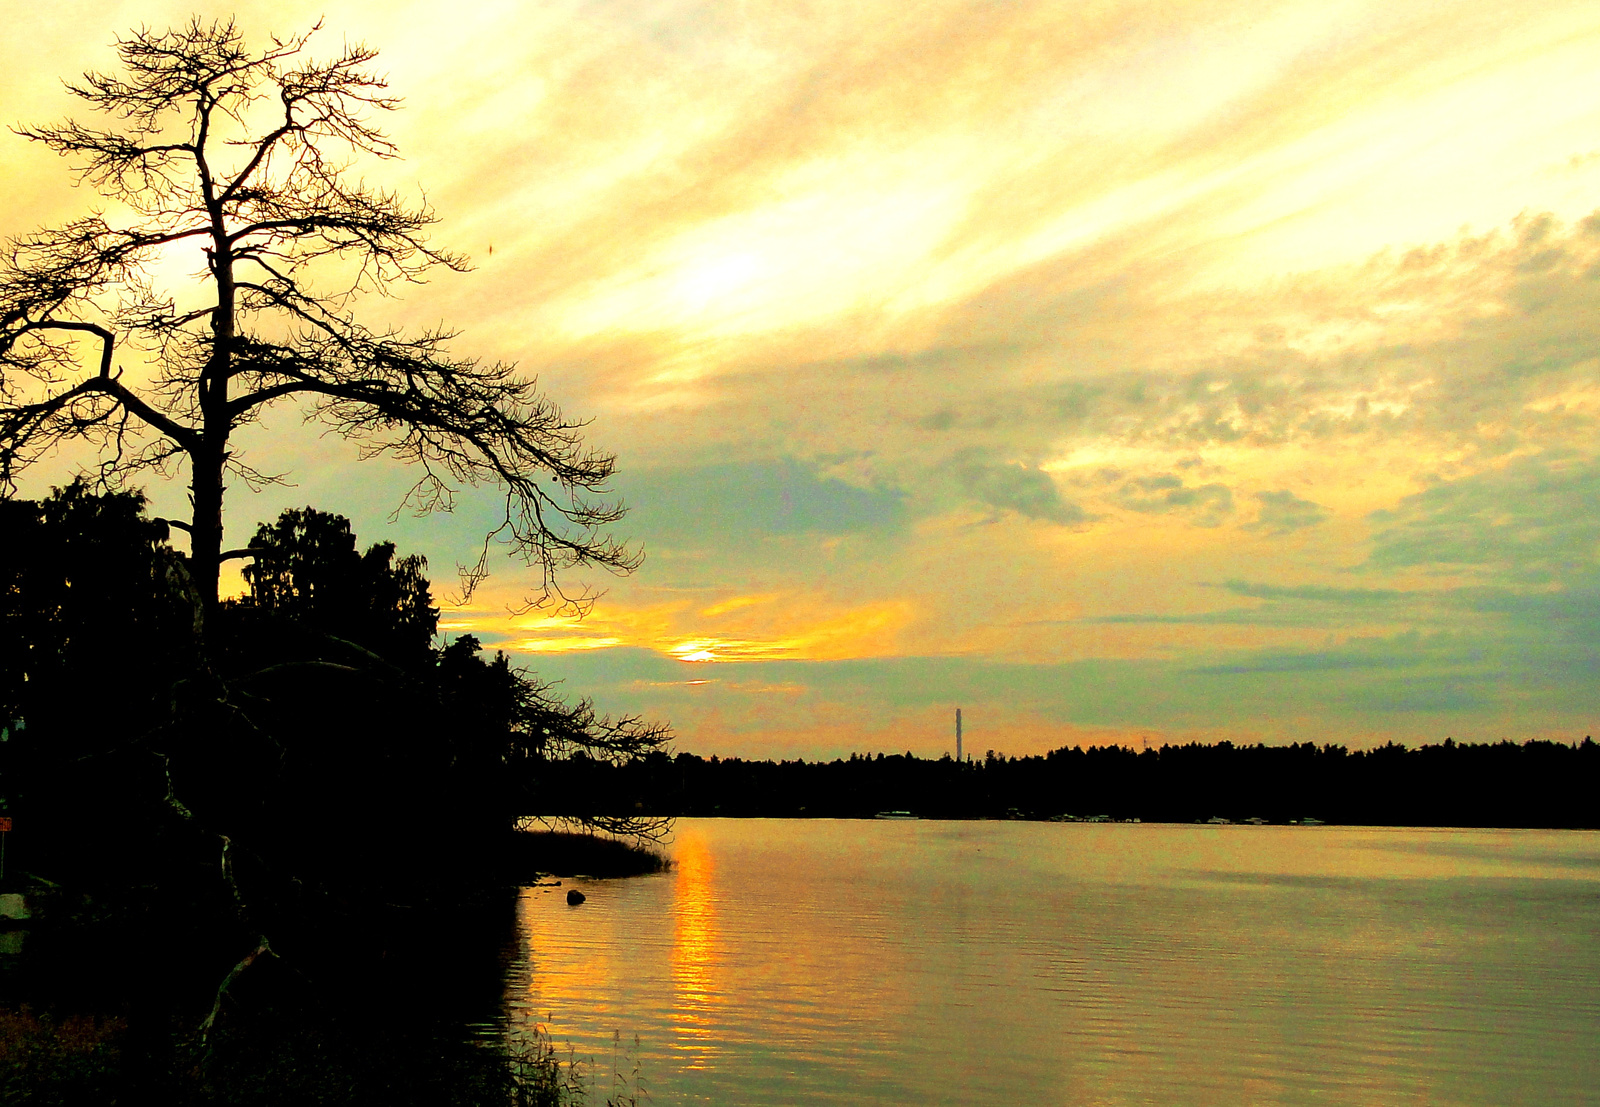 Arany naplemente